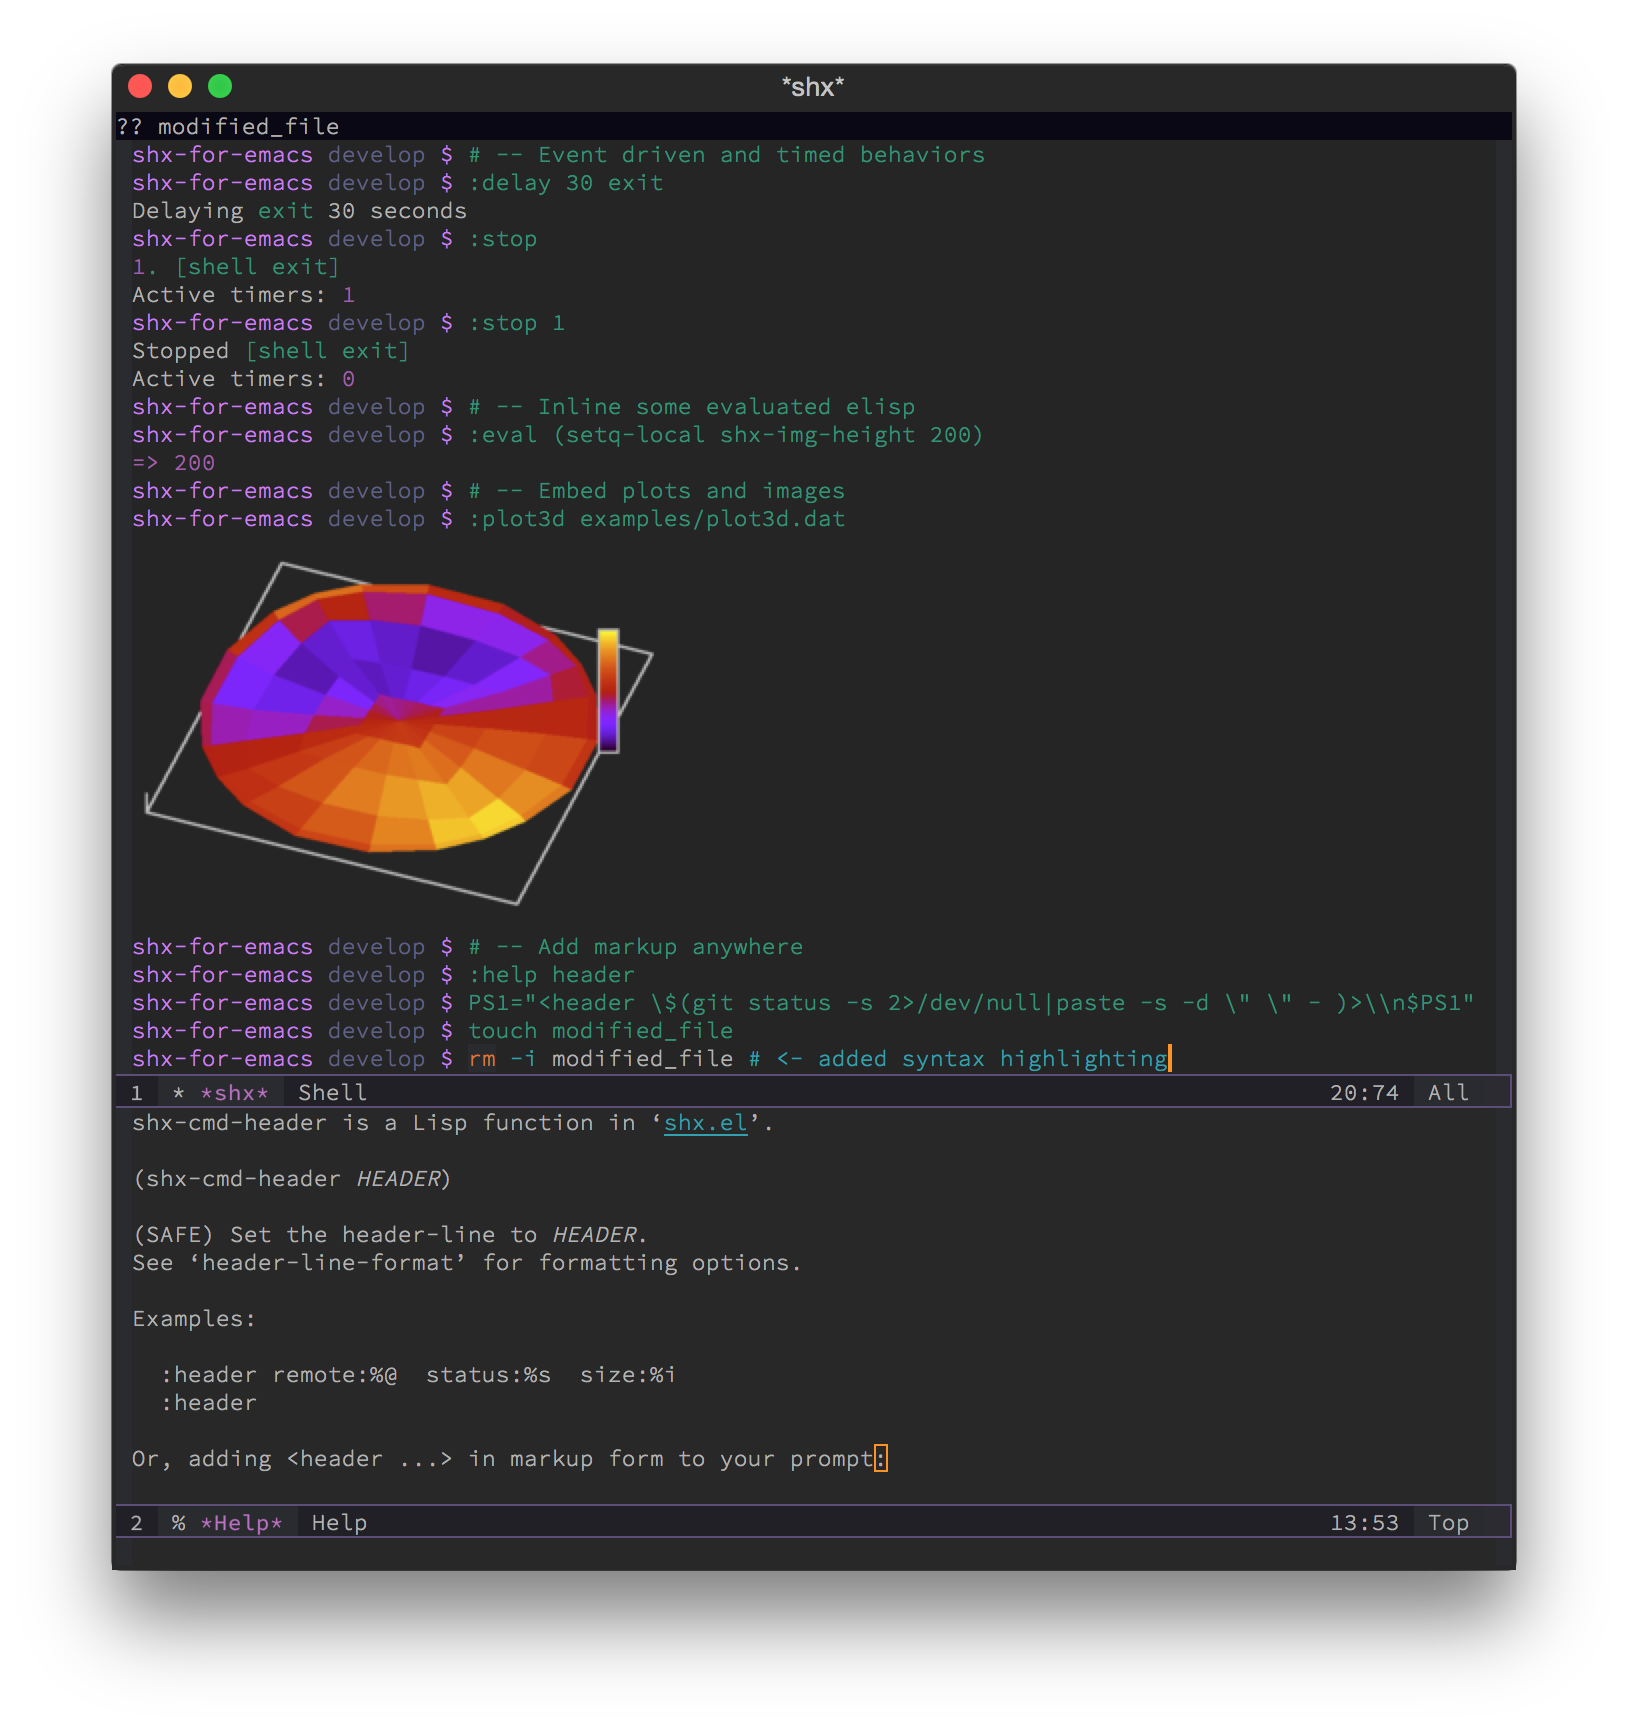 https://github.com/riscy/shx-for-emacs/blob/master/img/screenshot.png